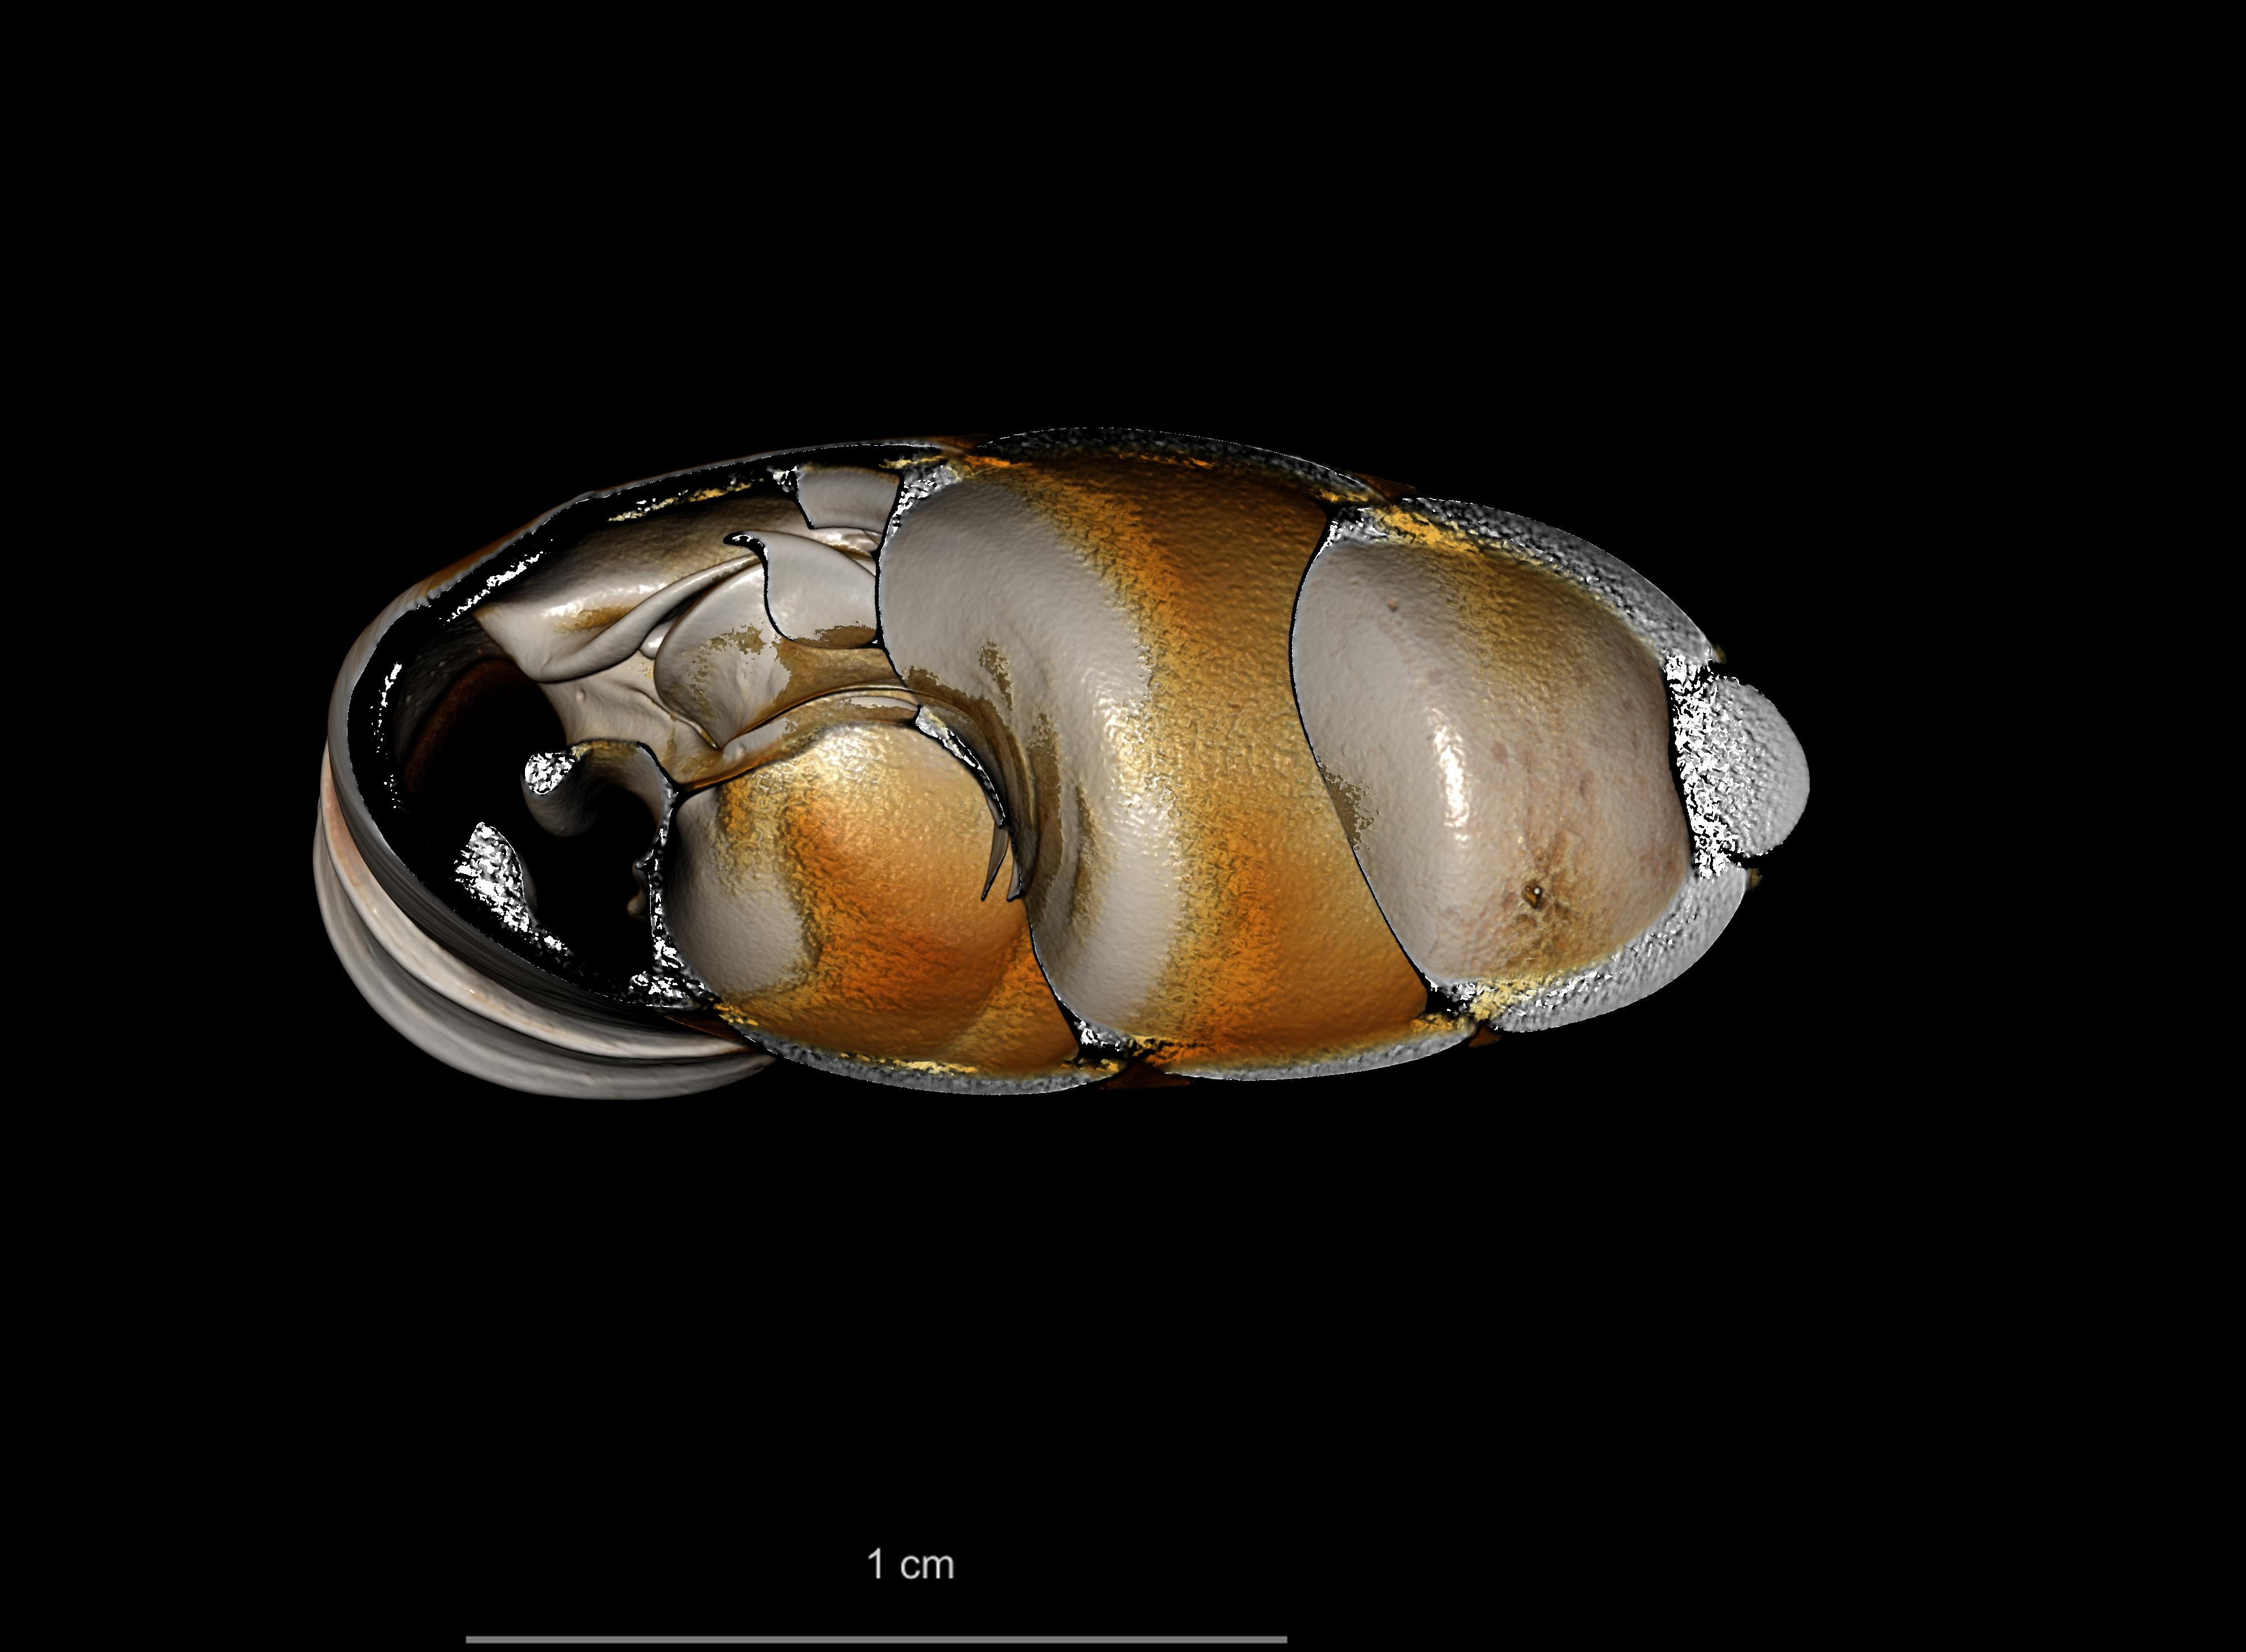 BE-RBINS-INV SYNTYPE MT 2417 Clausilia mansuyi MCT XRE DORSAL CUT.jpg